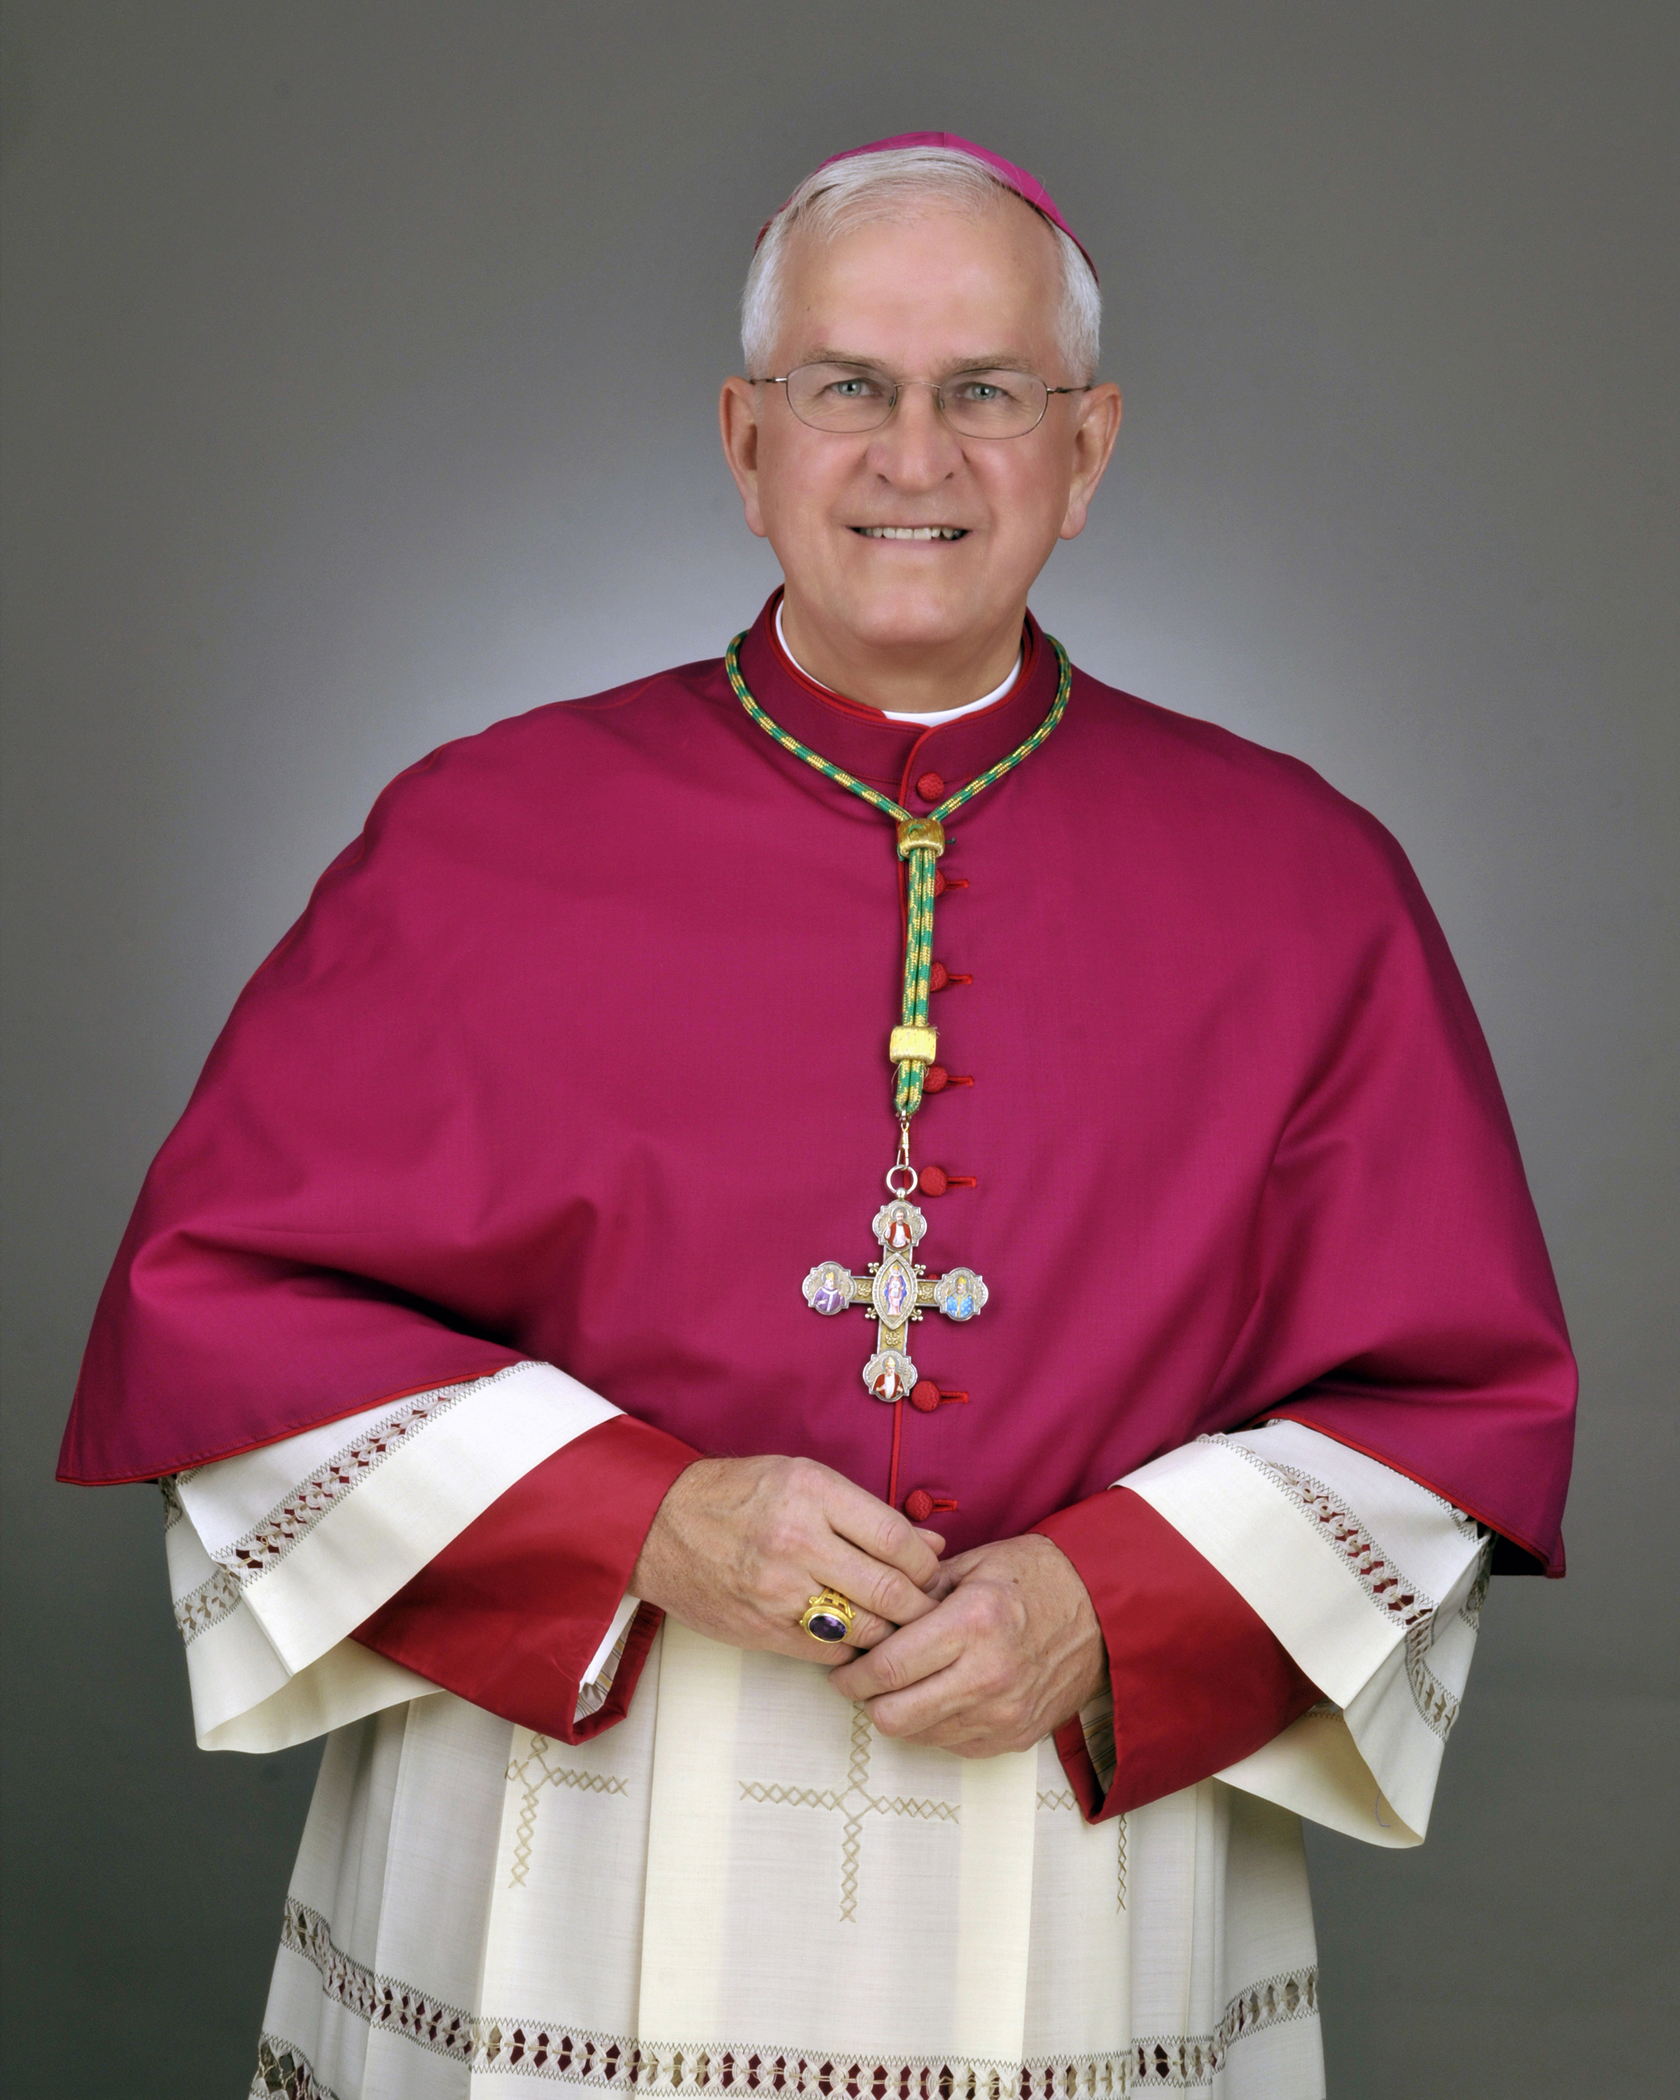 Archbishop Joseph Edward Kurtz of Louisville  Chairman